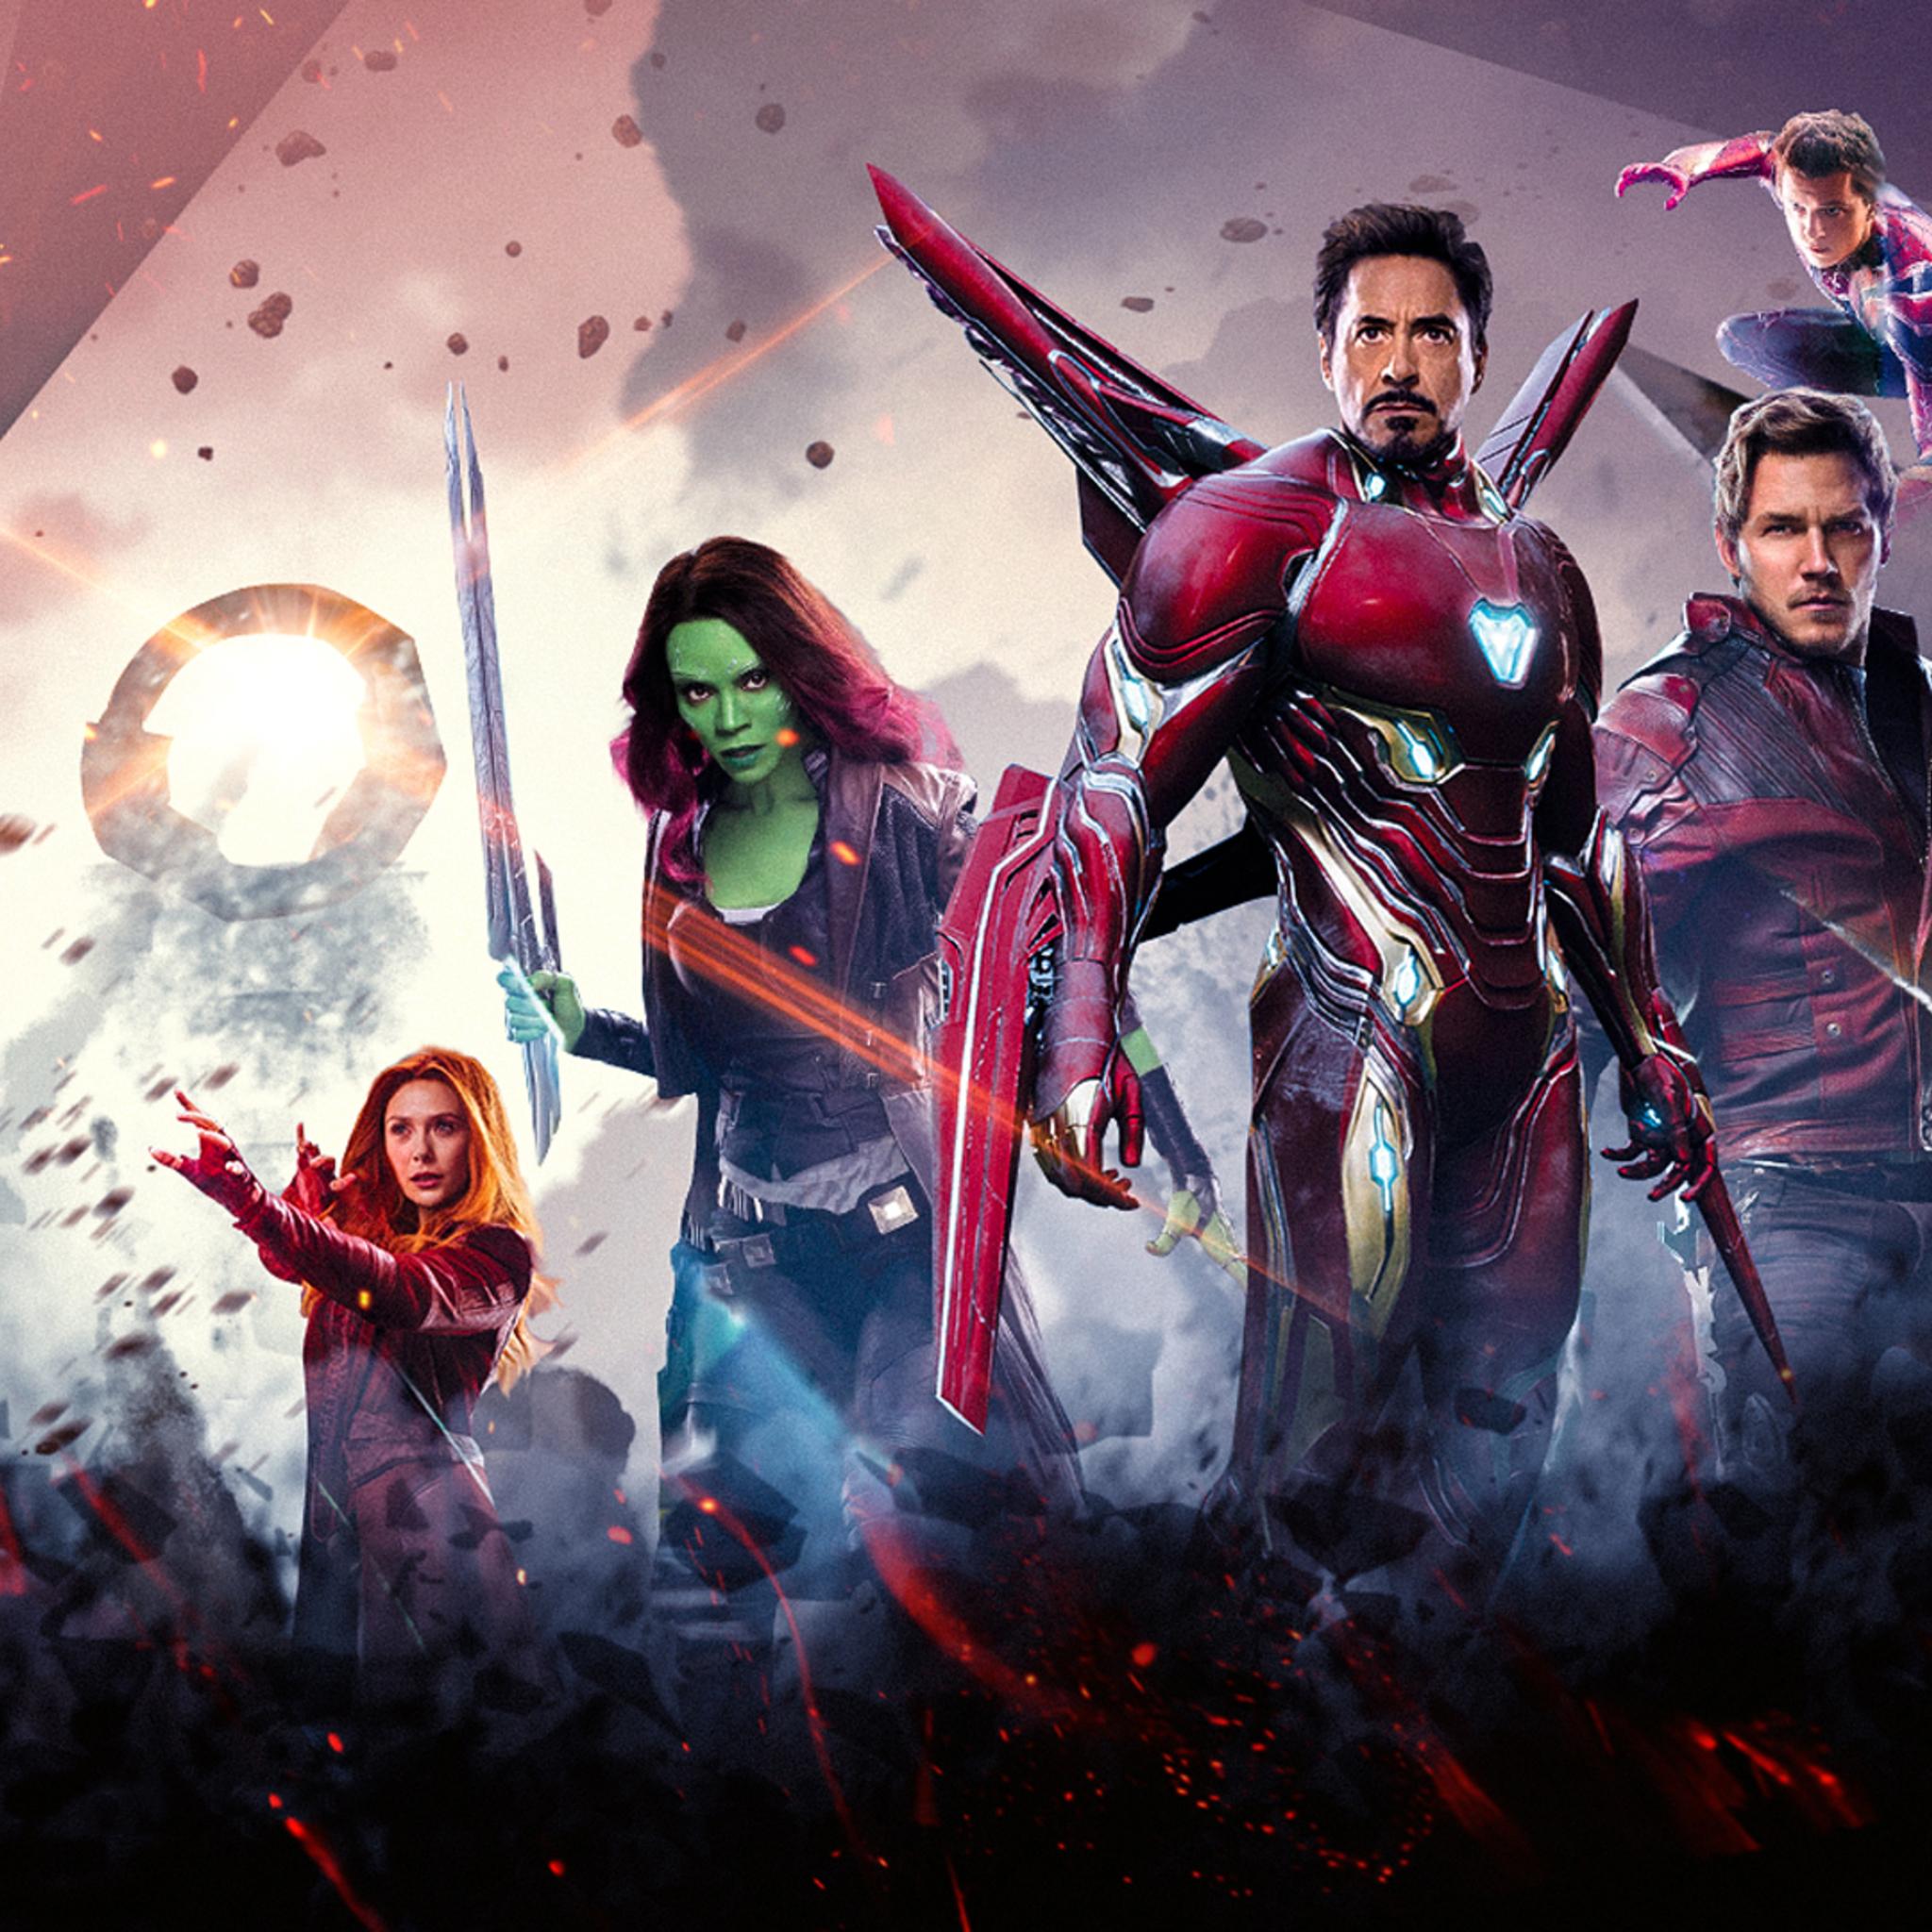 2048x2048 Avengers Infinity War Poster 2018 Ipad Air HD 4k